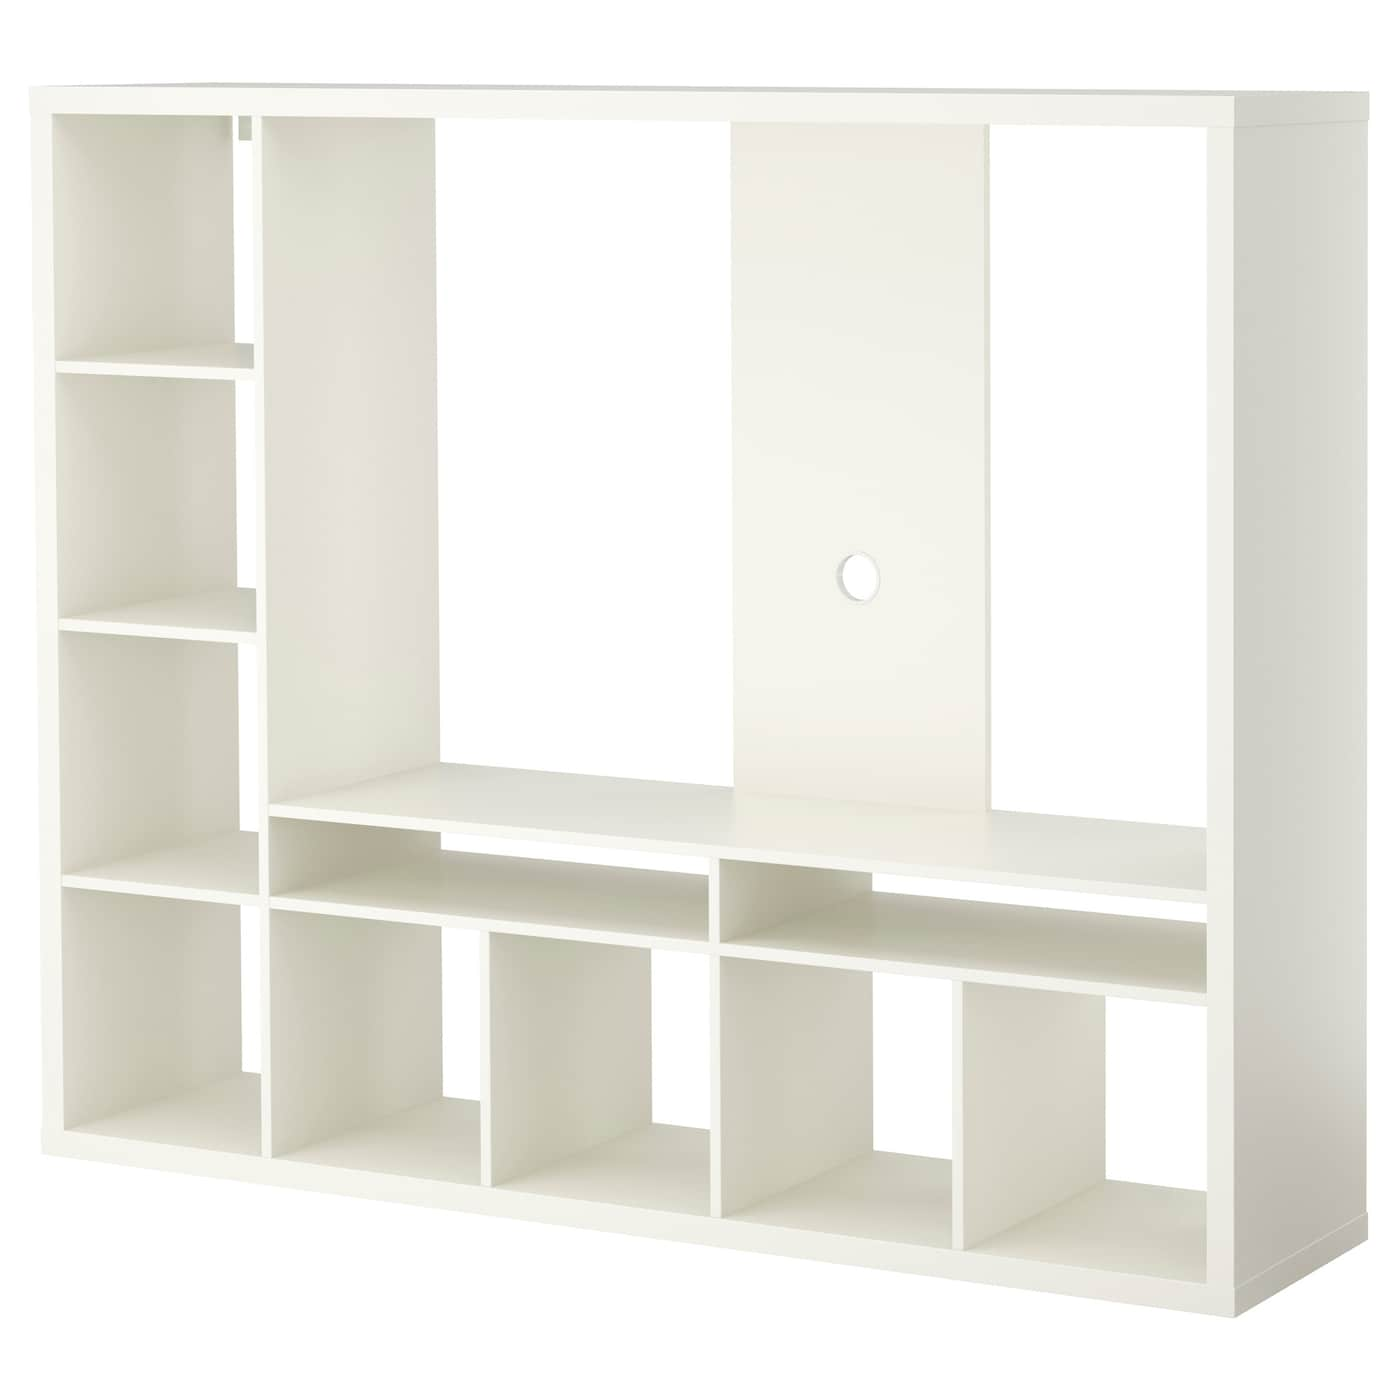 Lappland Meuble Tv Blanc 183×147 Cm Ikea # Meuble Tv Ecran Plat Ikea